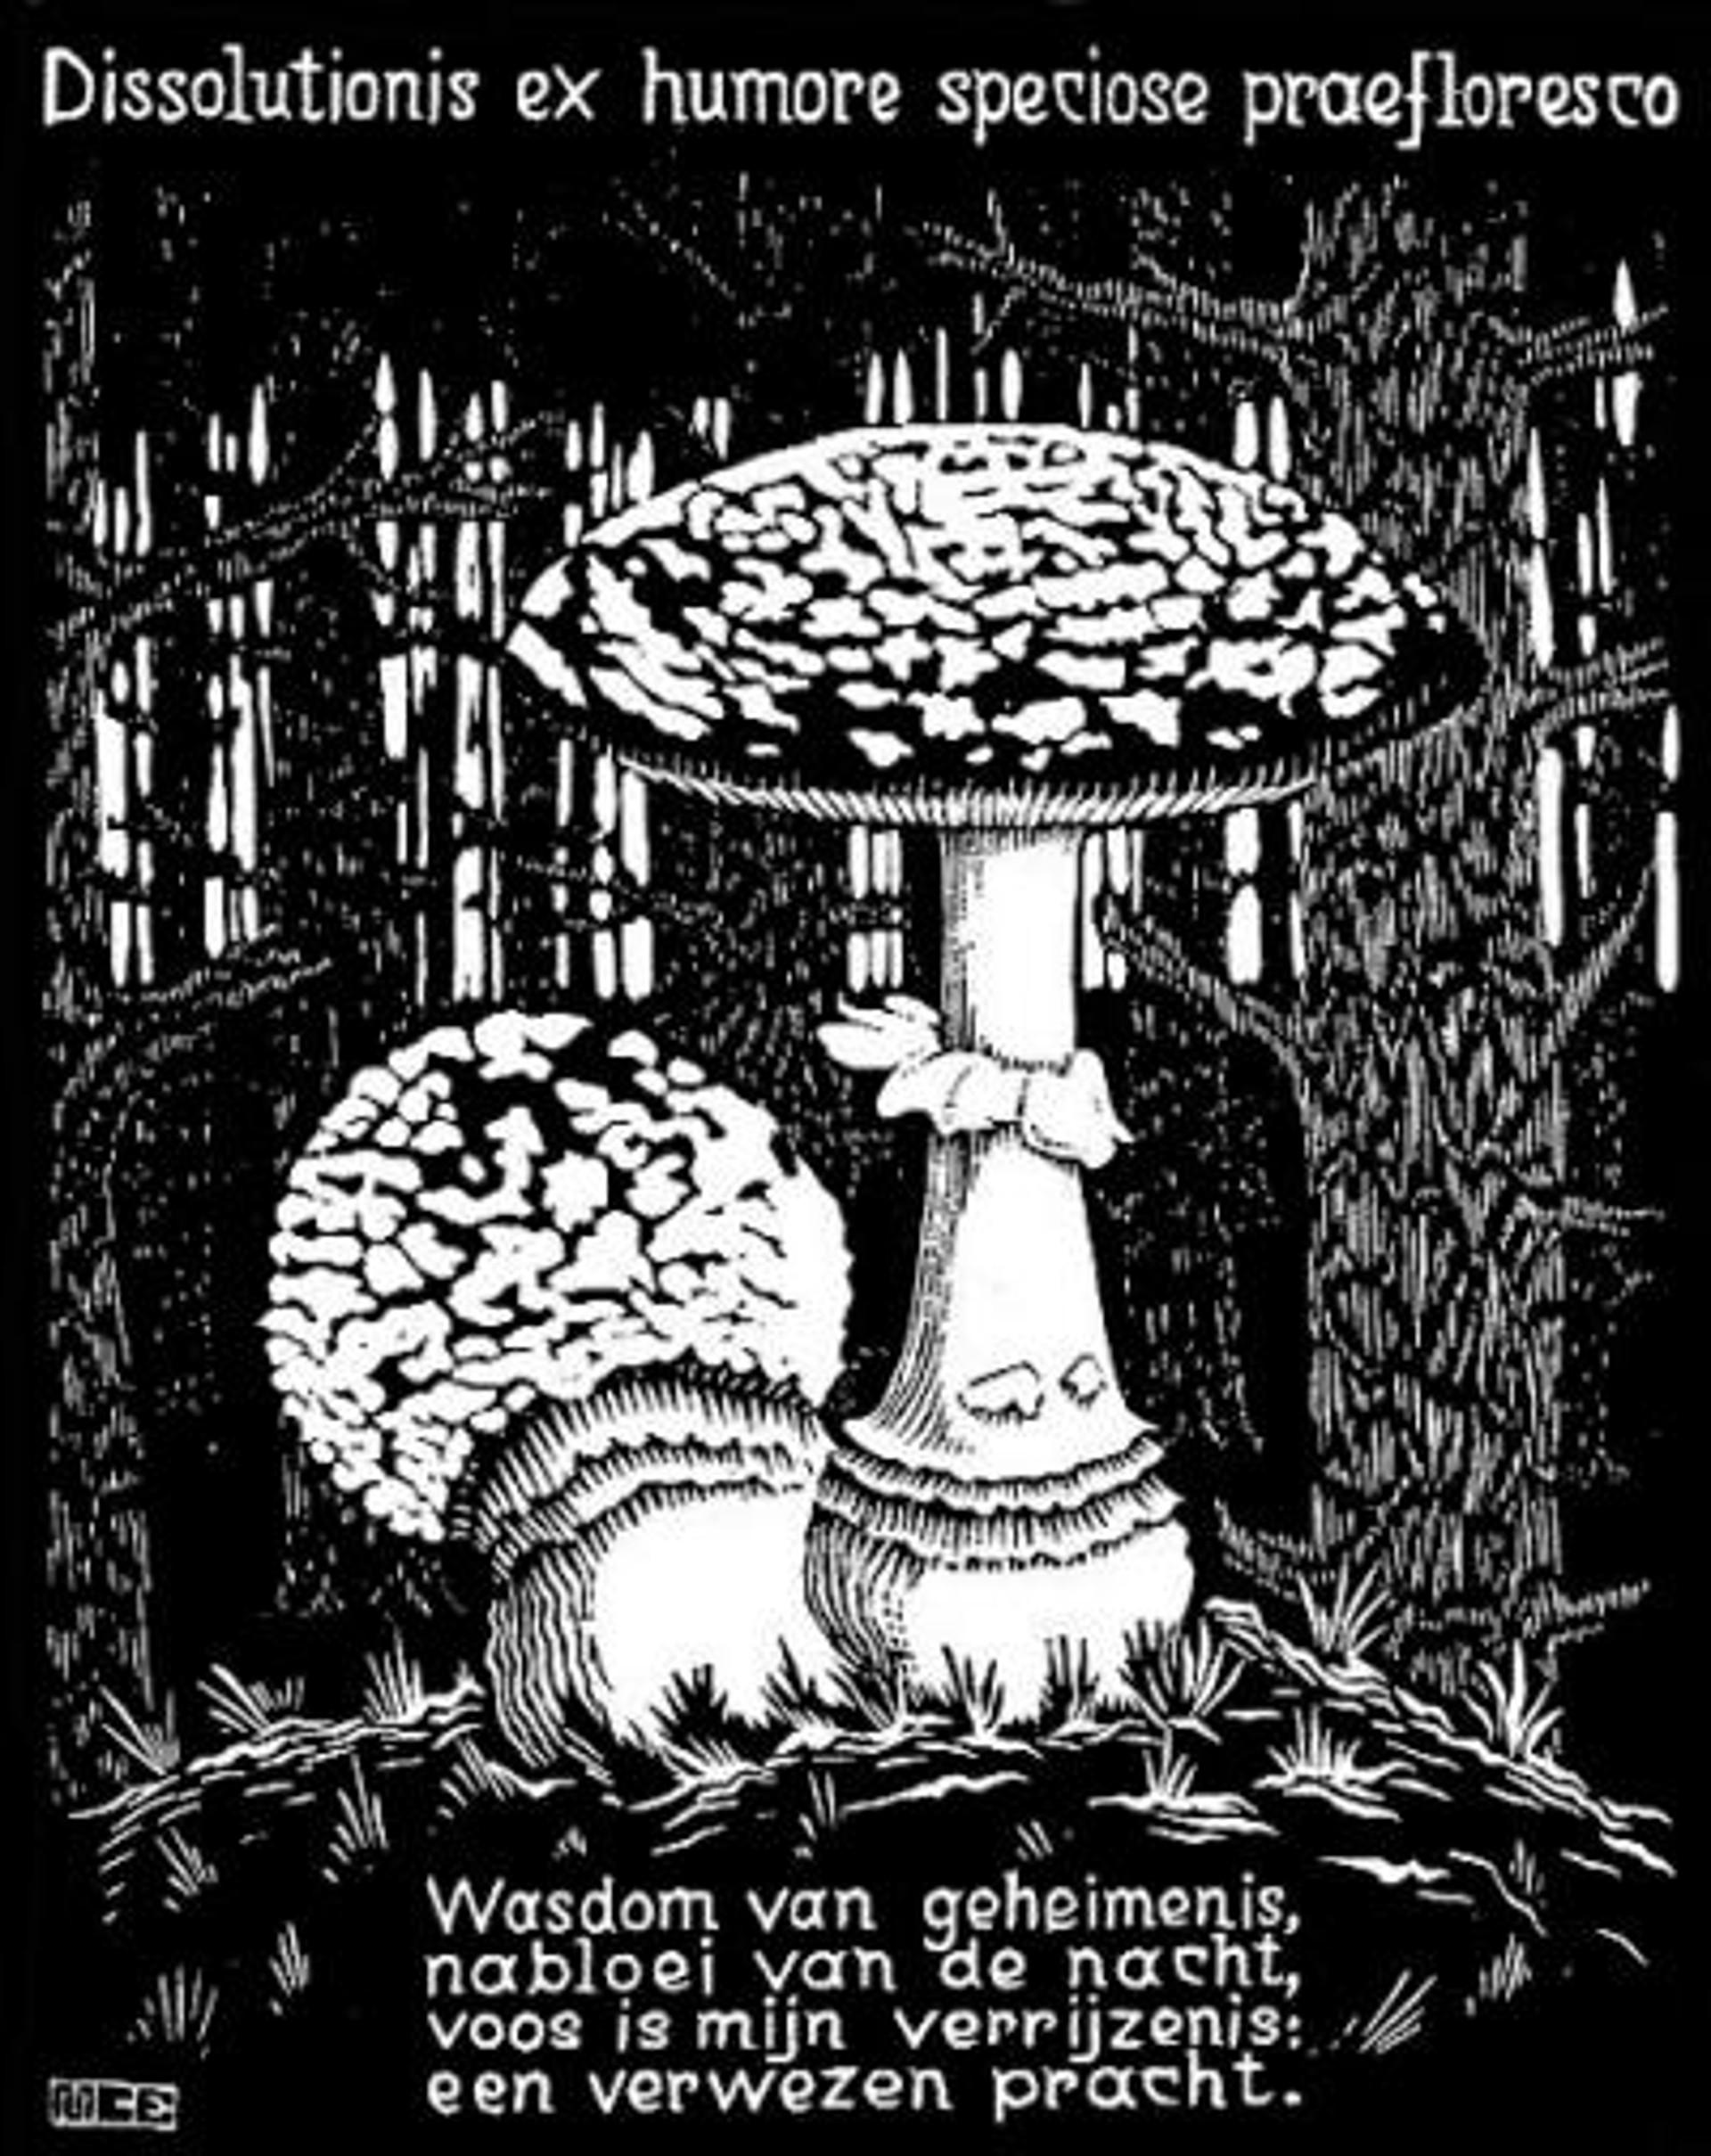 Emblemata - Toadstool by M.C. Escher